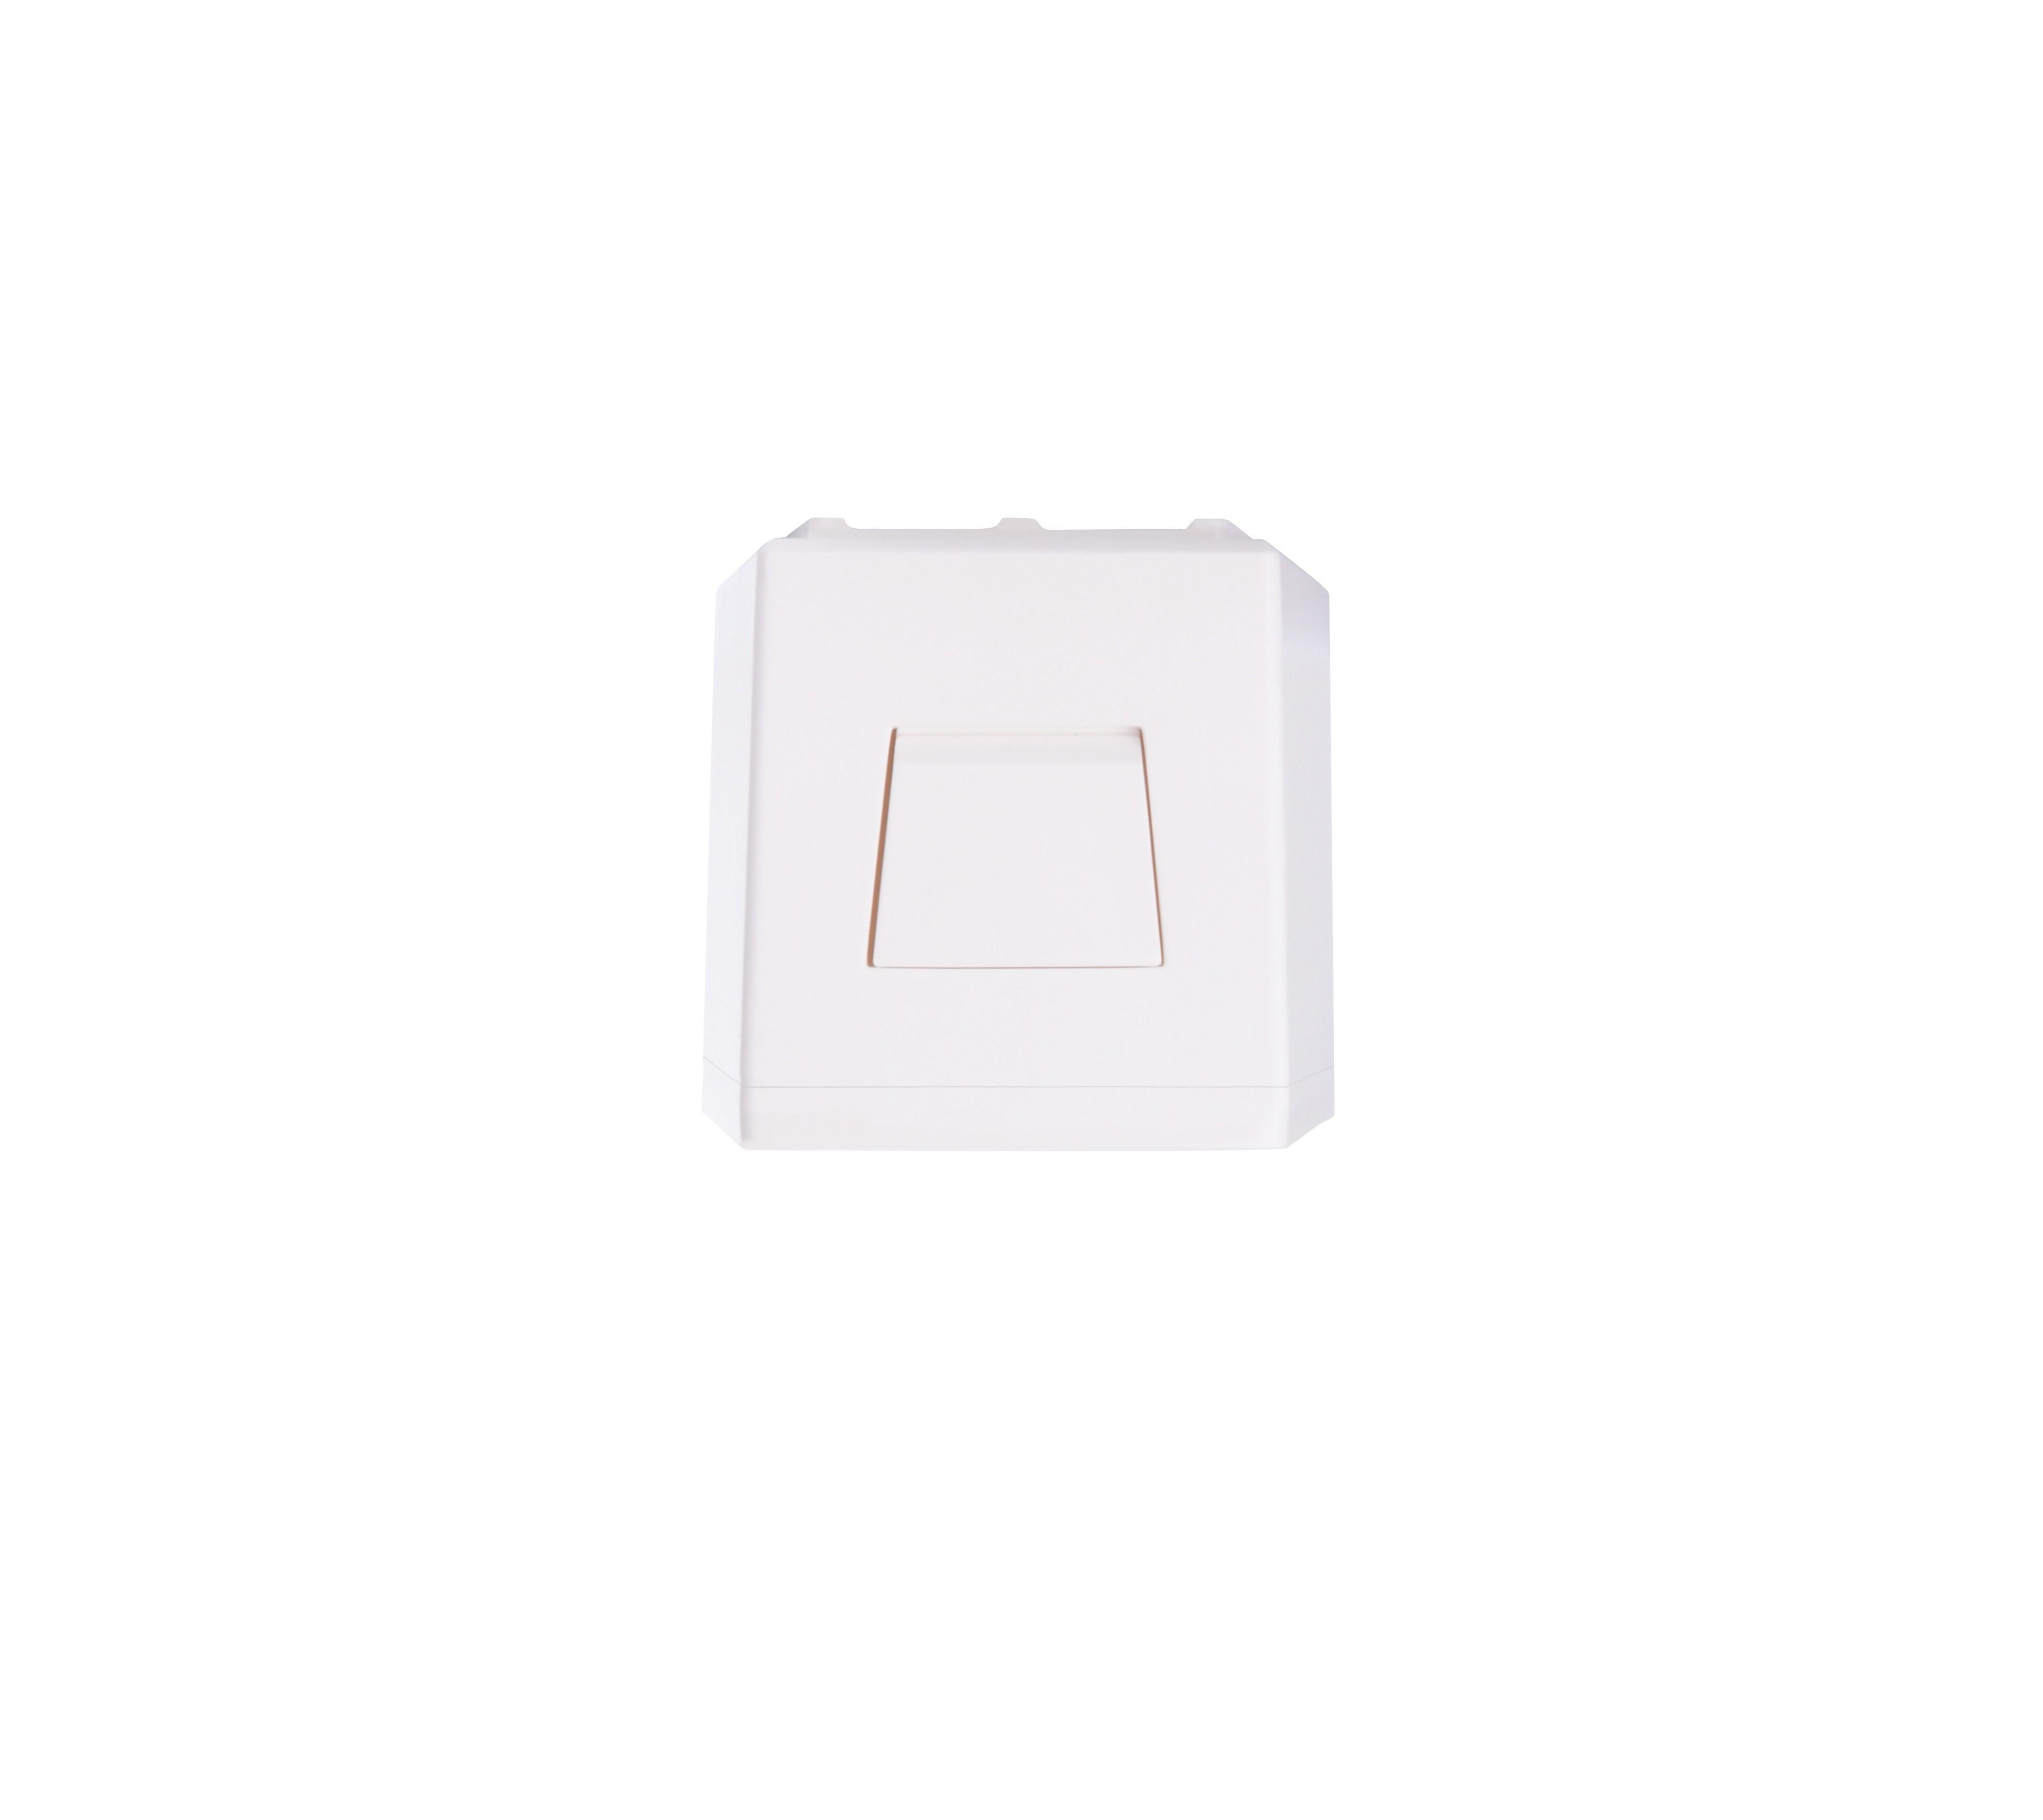 Lampa emergenta led Intelight 94523   3h nementinut test automat1